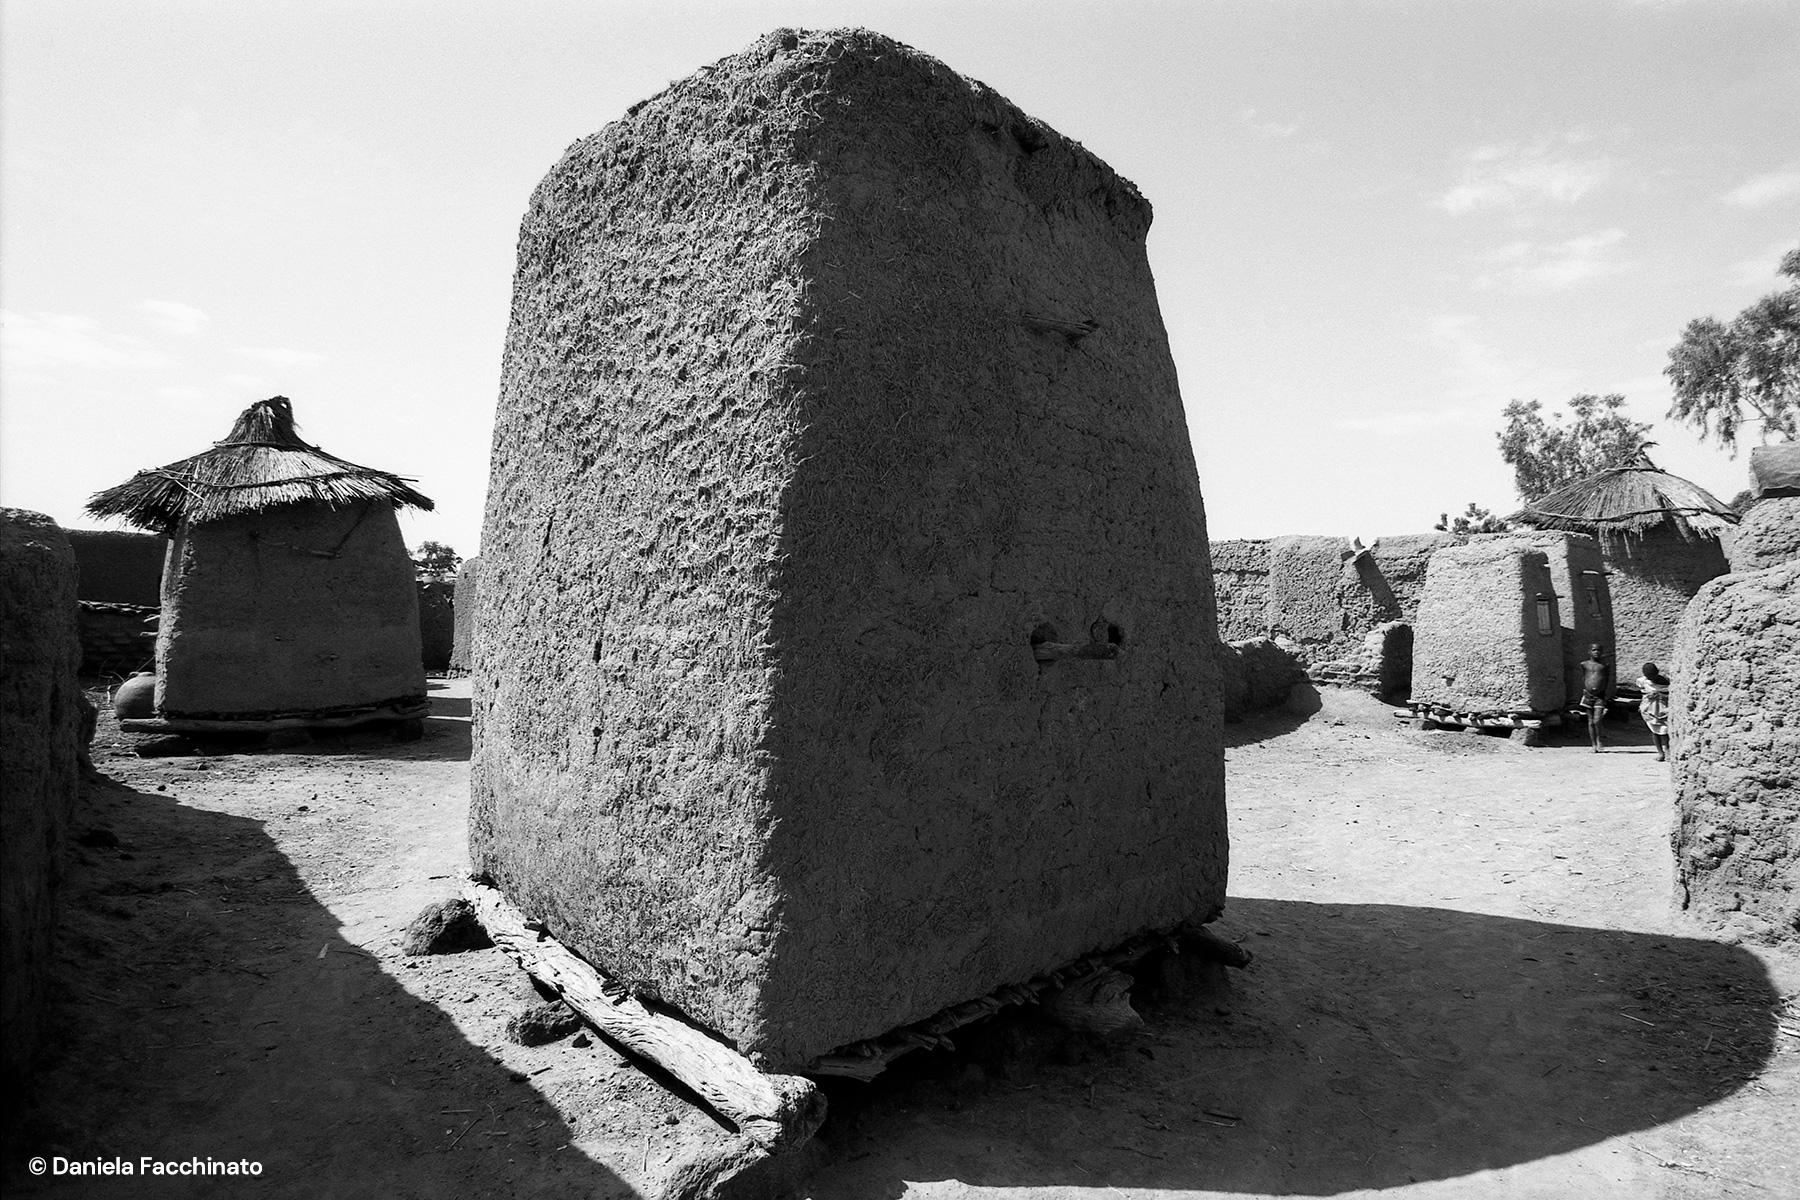 Bambara village, Mali, 1989. Mud granaries